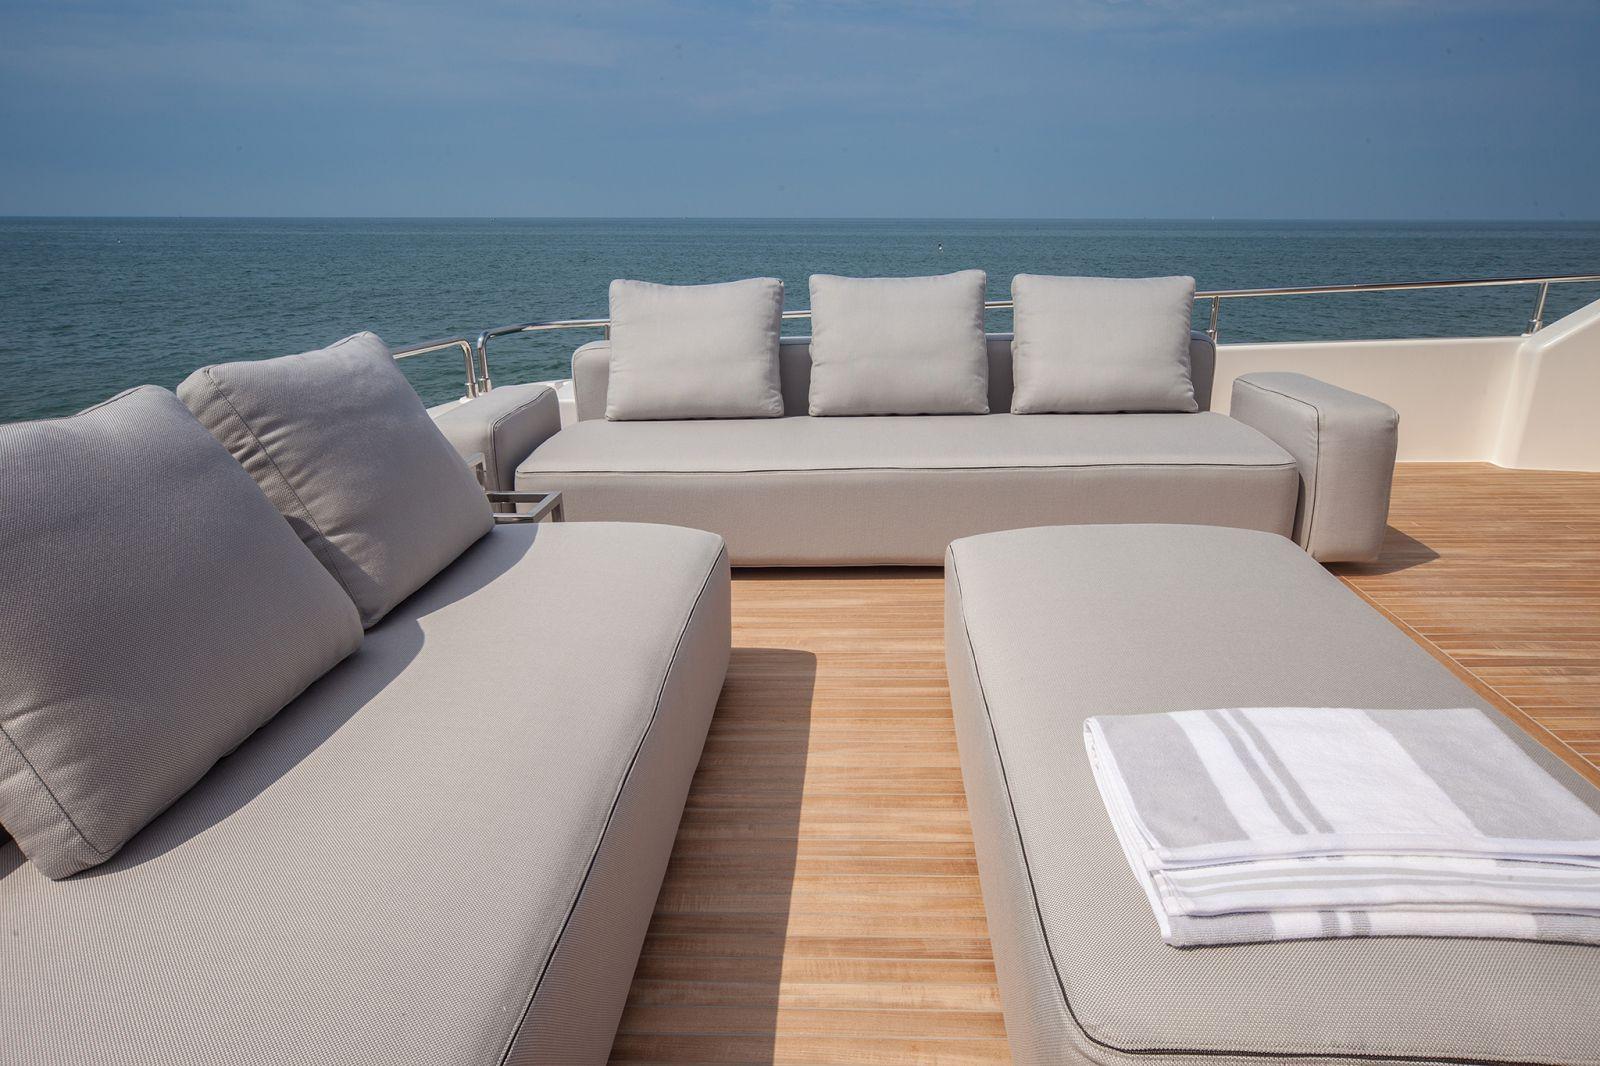 Ferretti Yachts 960 Flybridge - New Luxury Superyacht for Sale >